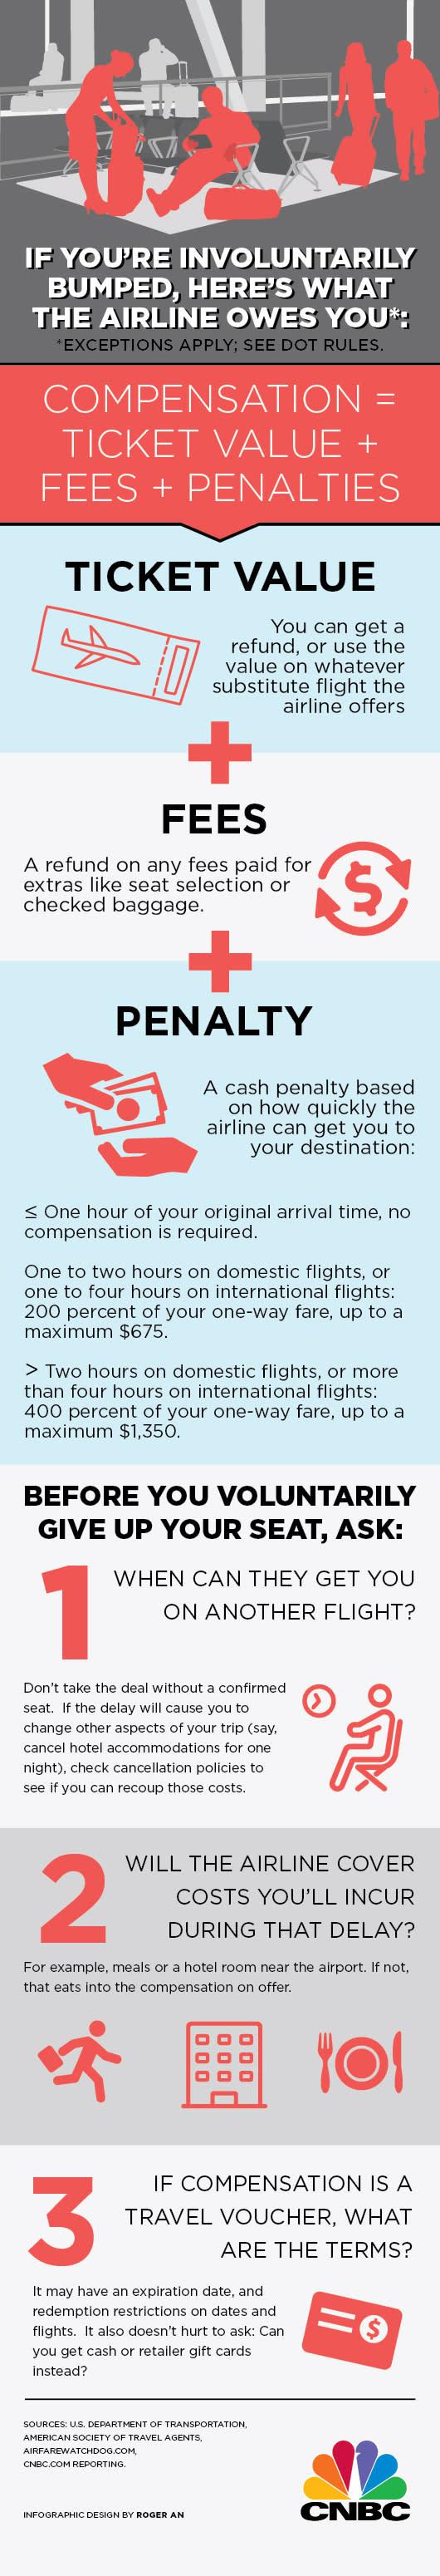 Flight bumped infographic